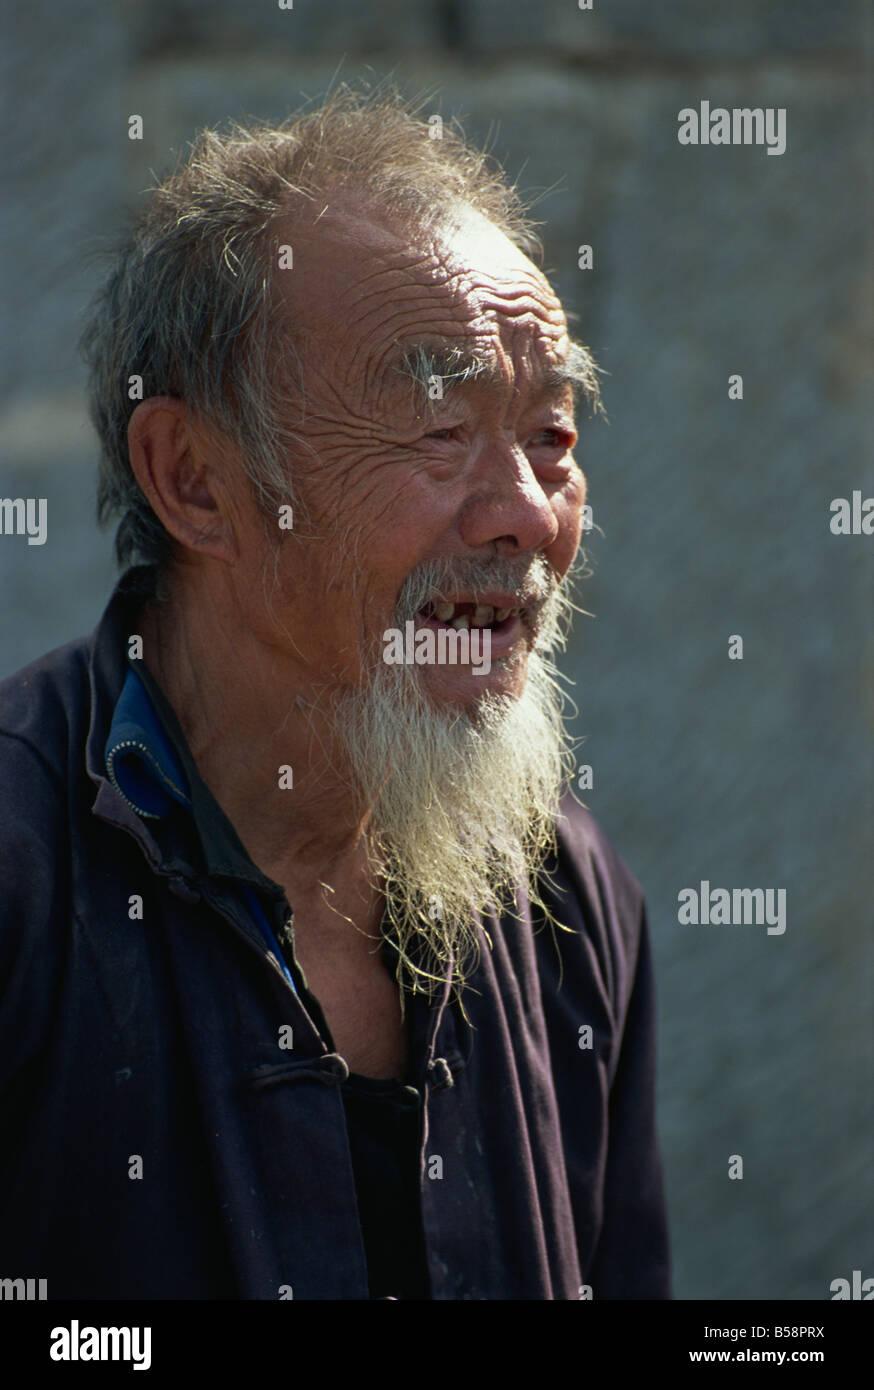 homme asiatique datant femme blanche Hook up Gainesville FL